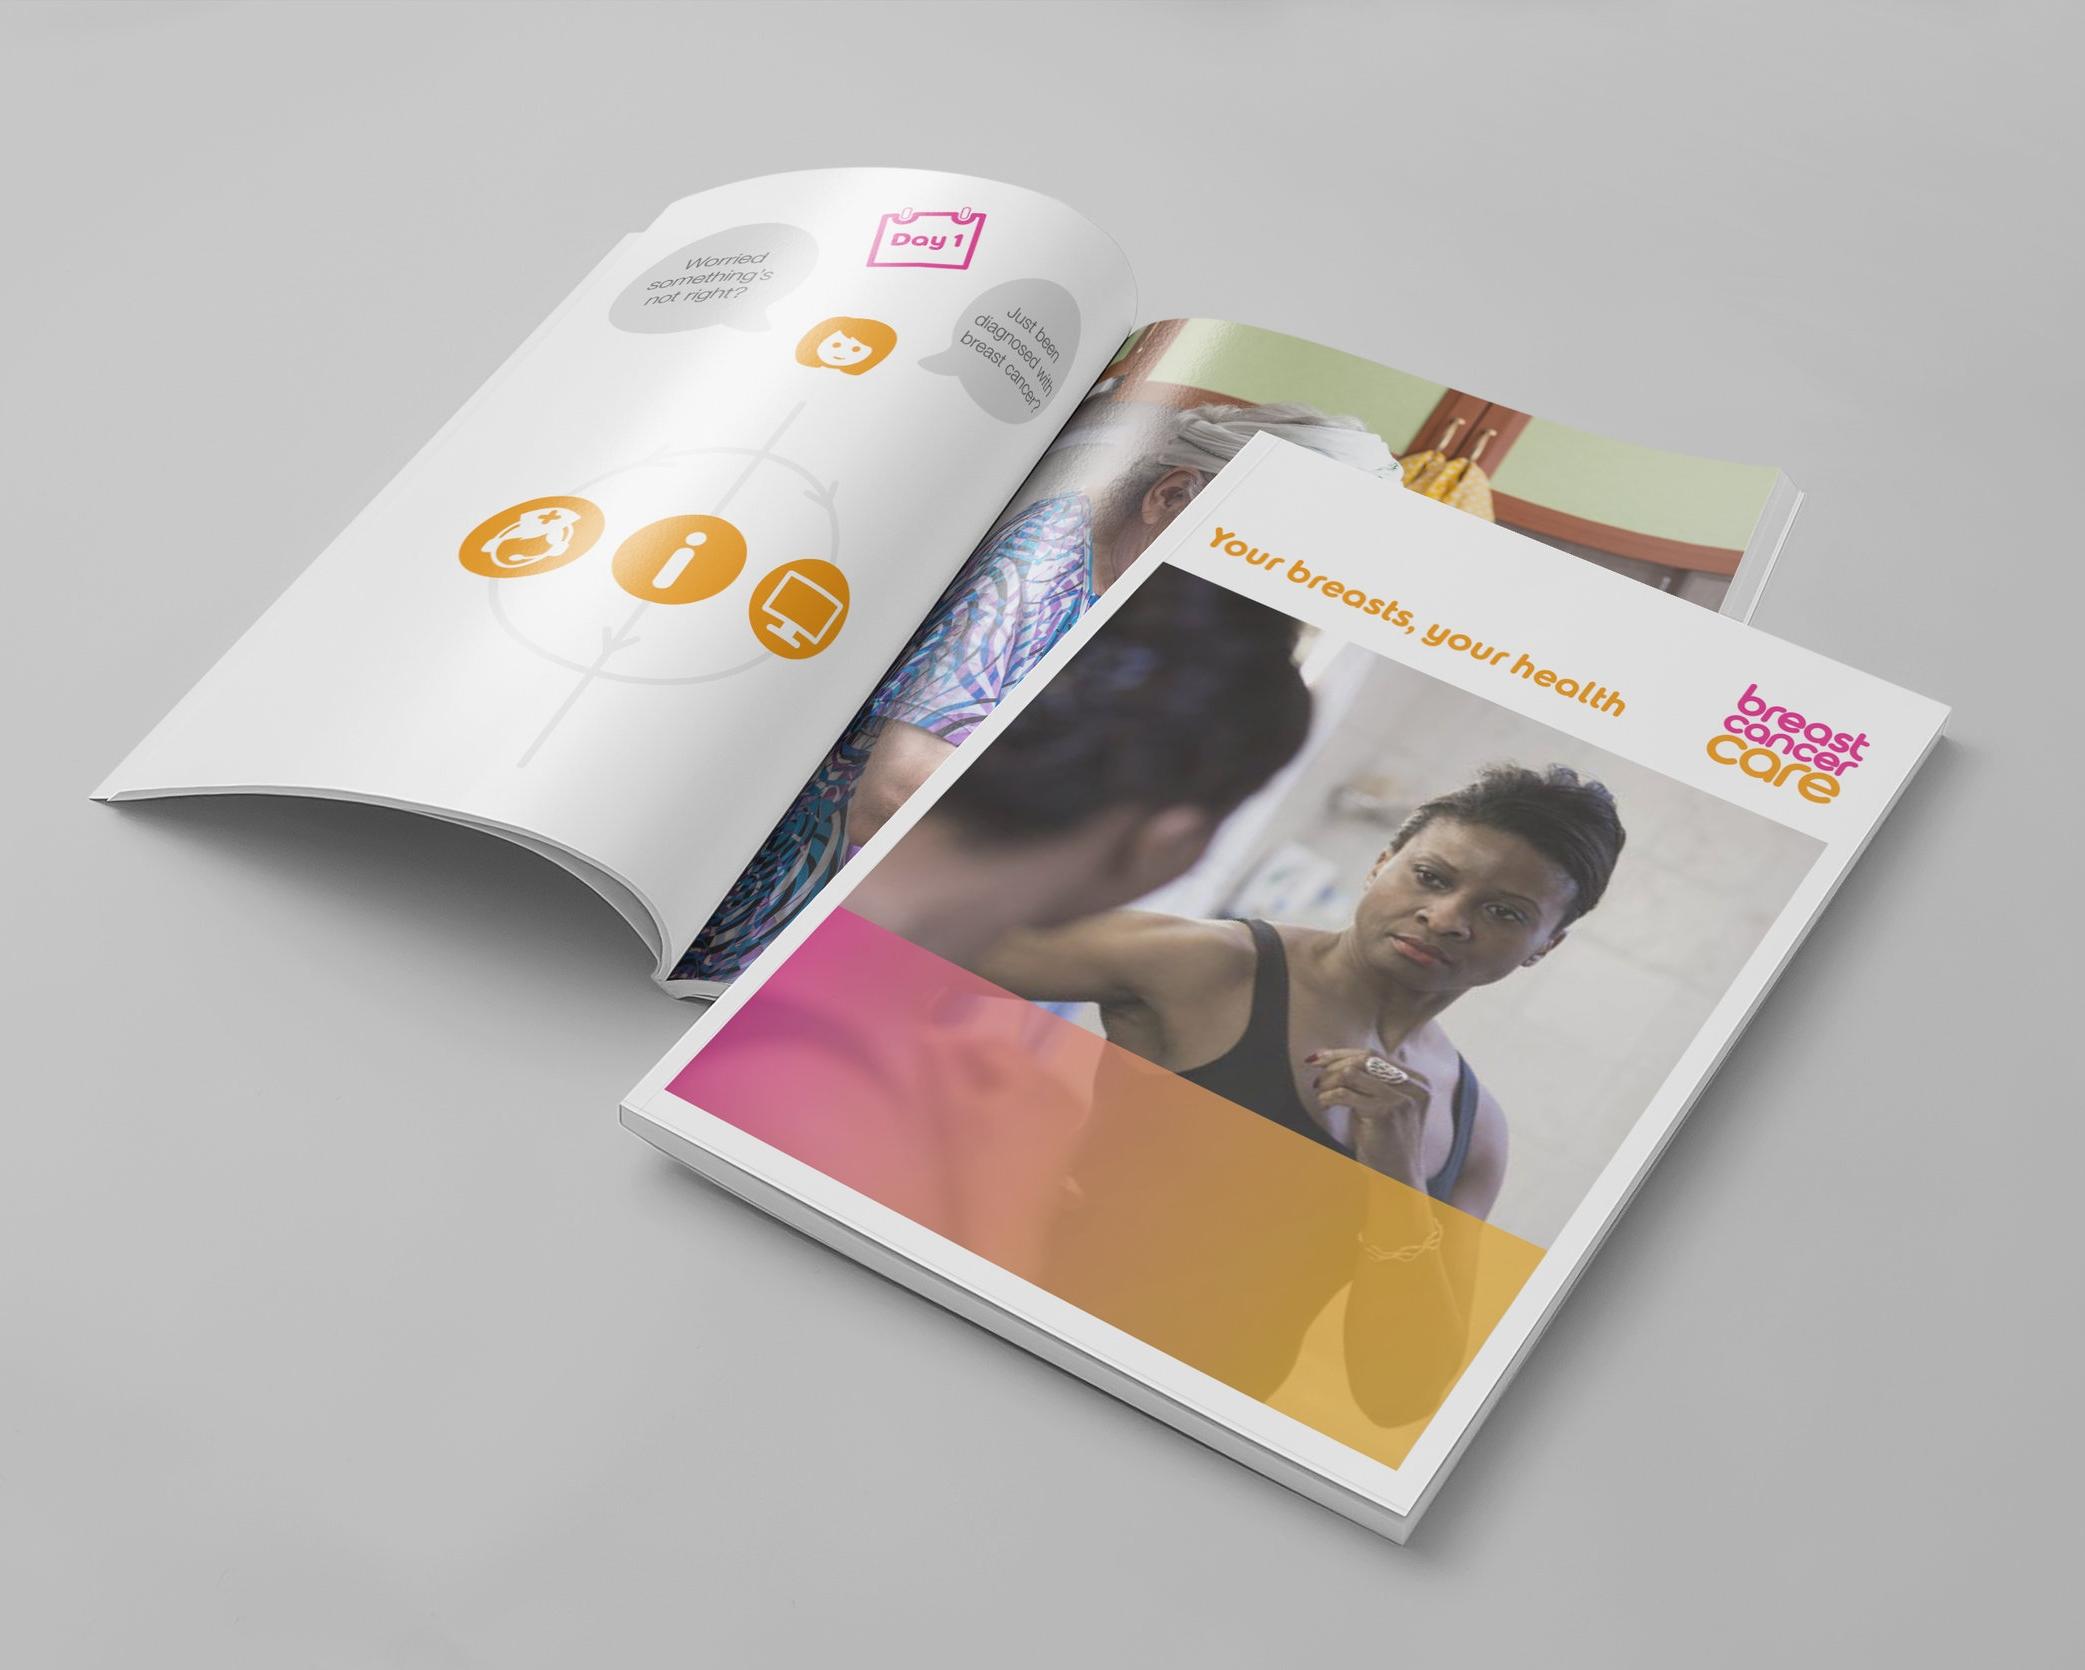 breastcancercare_booklet.jpg